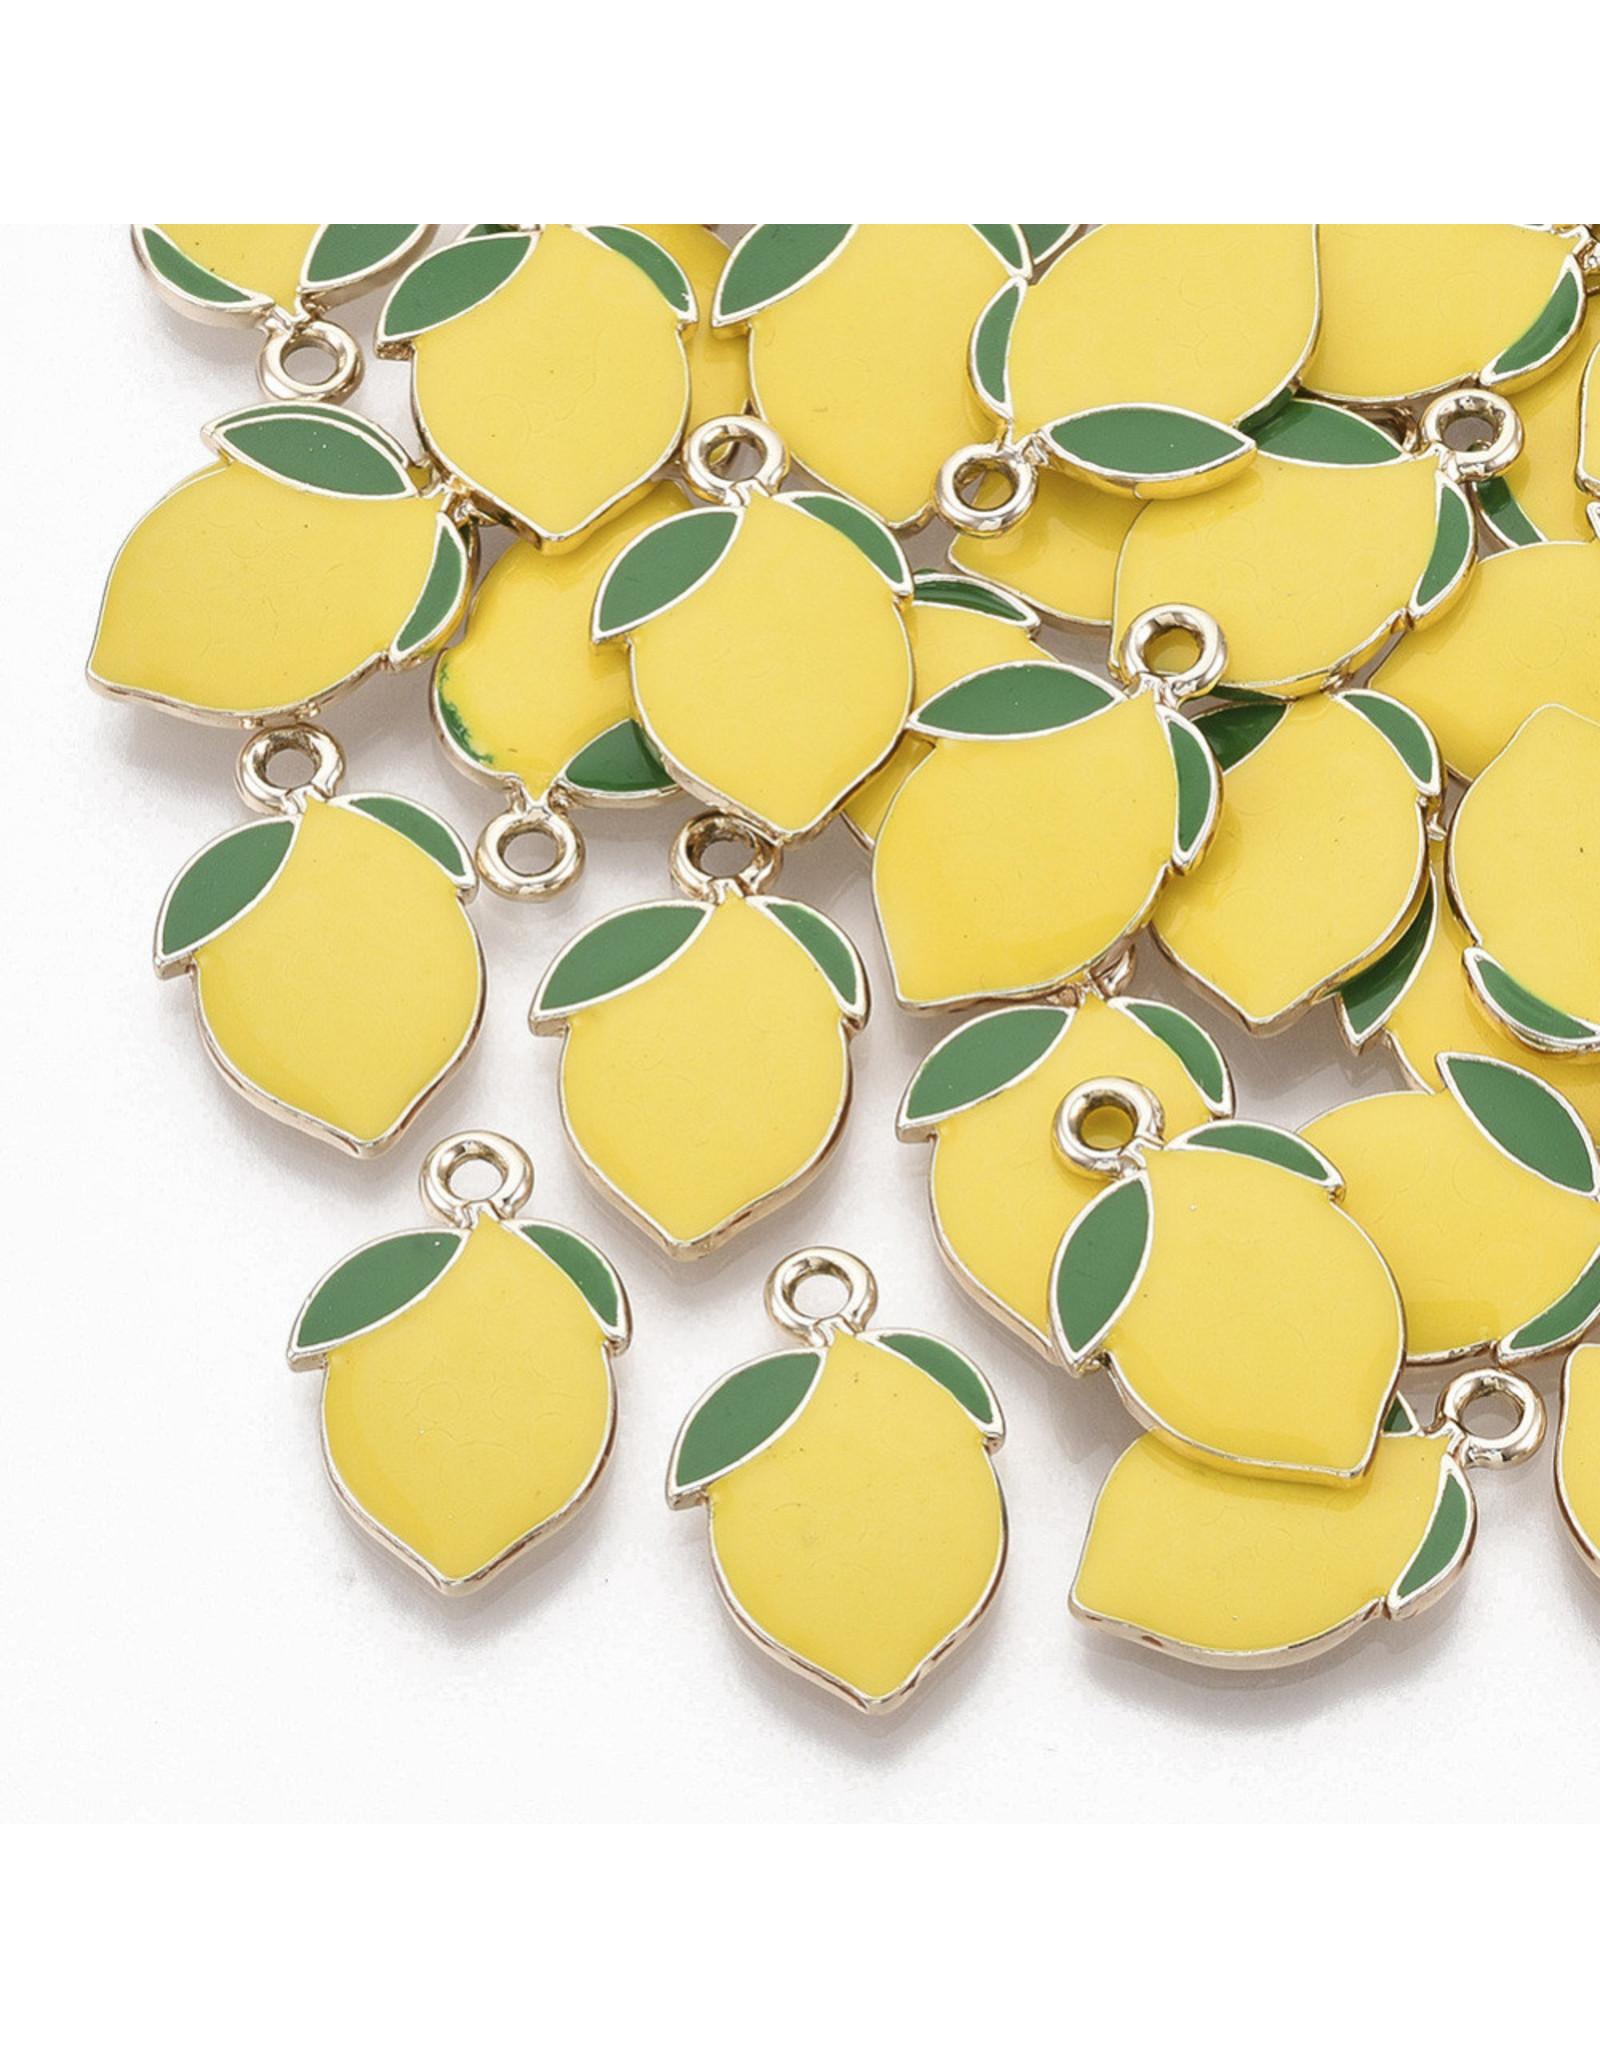 Lemon Charm 20x14mm Lemon Yellow Gold x10